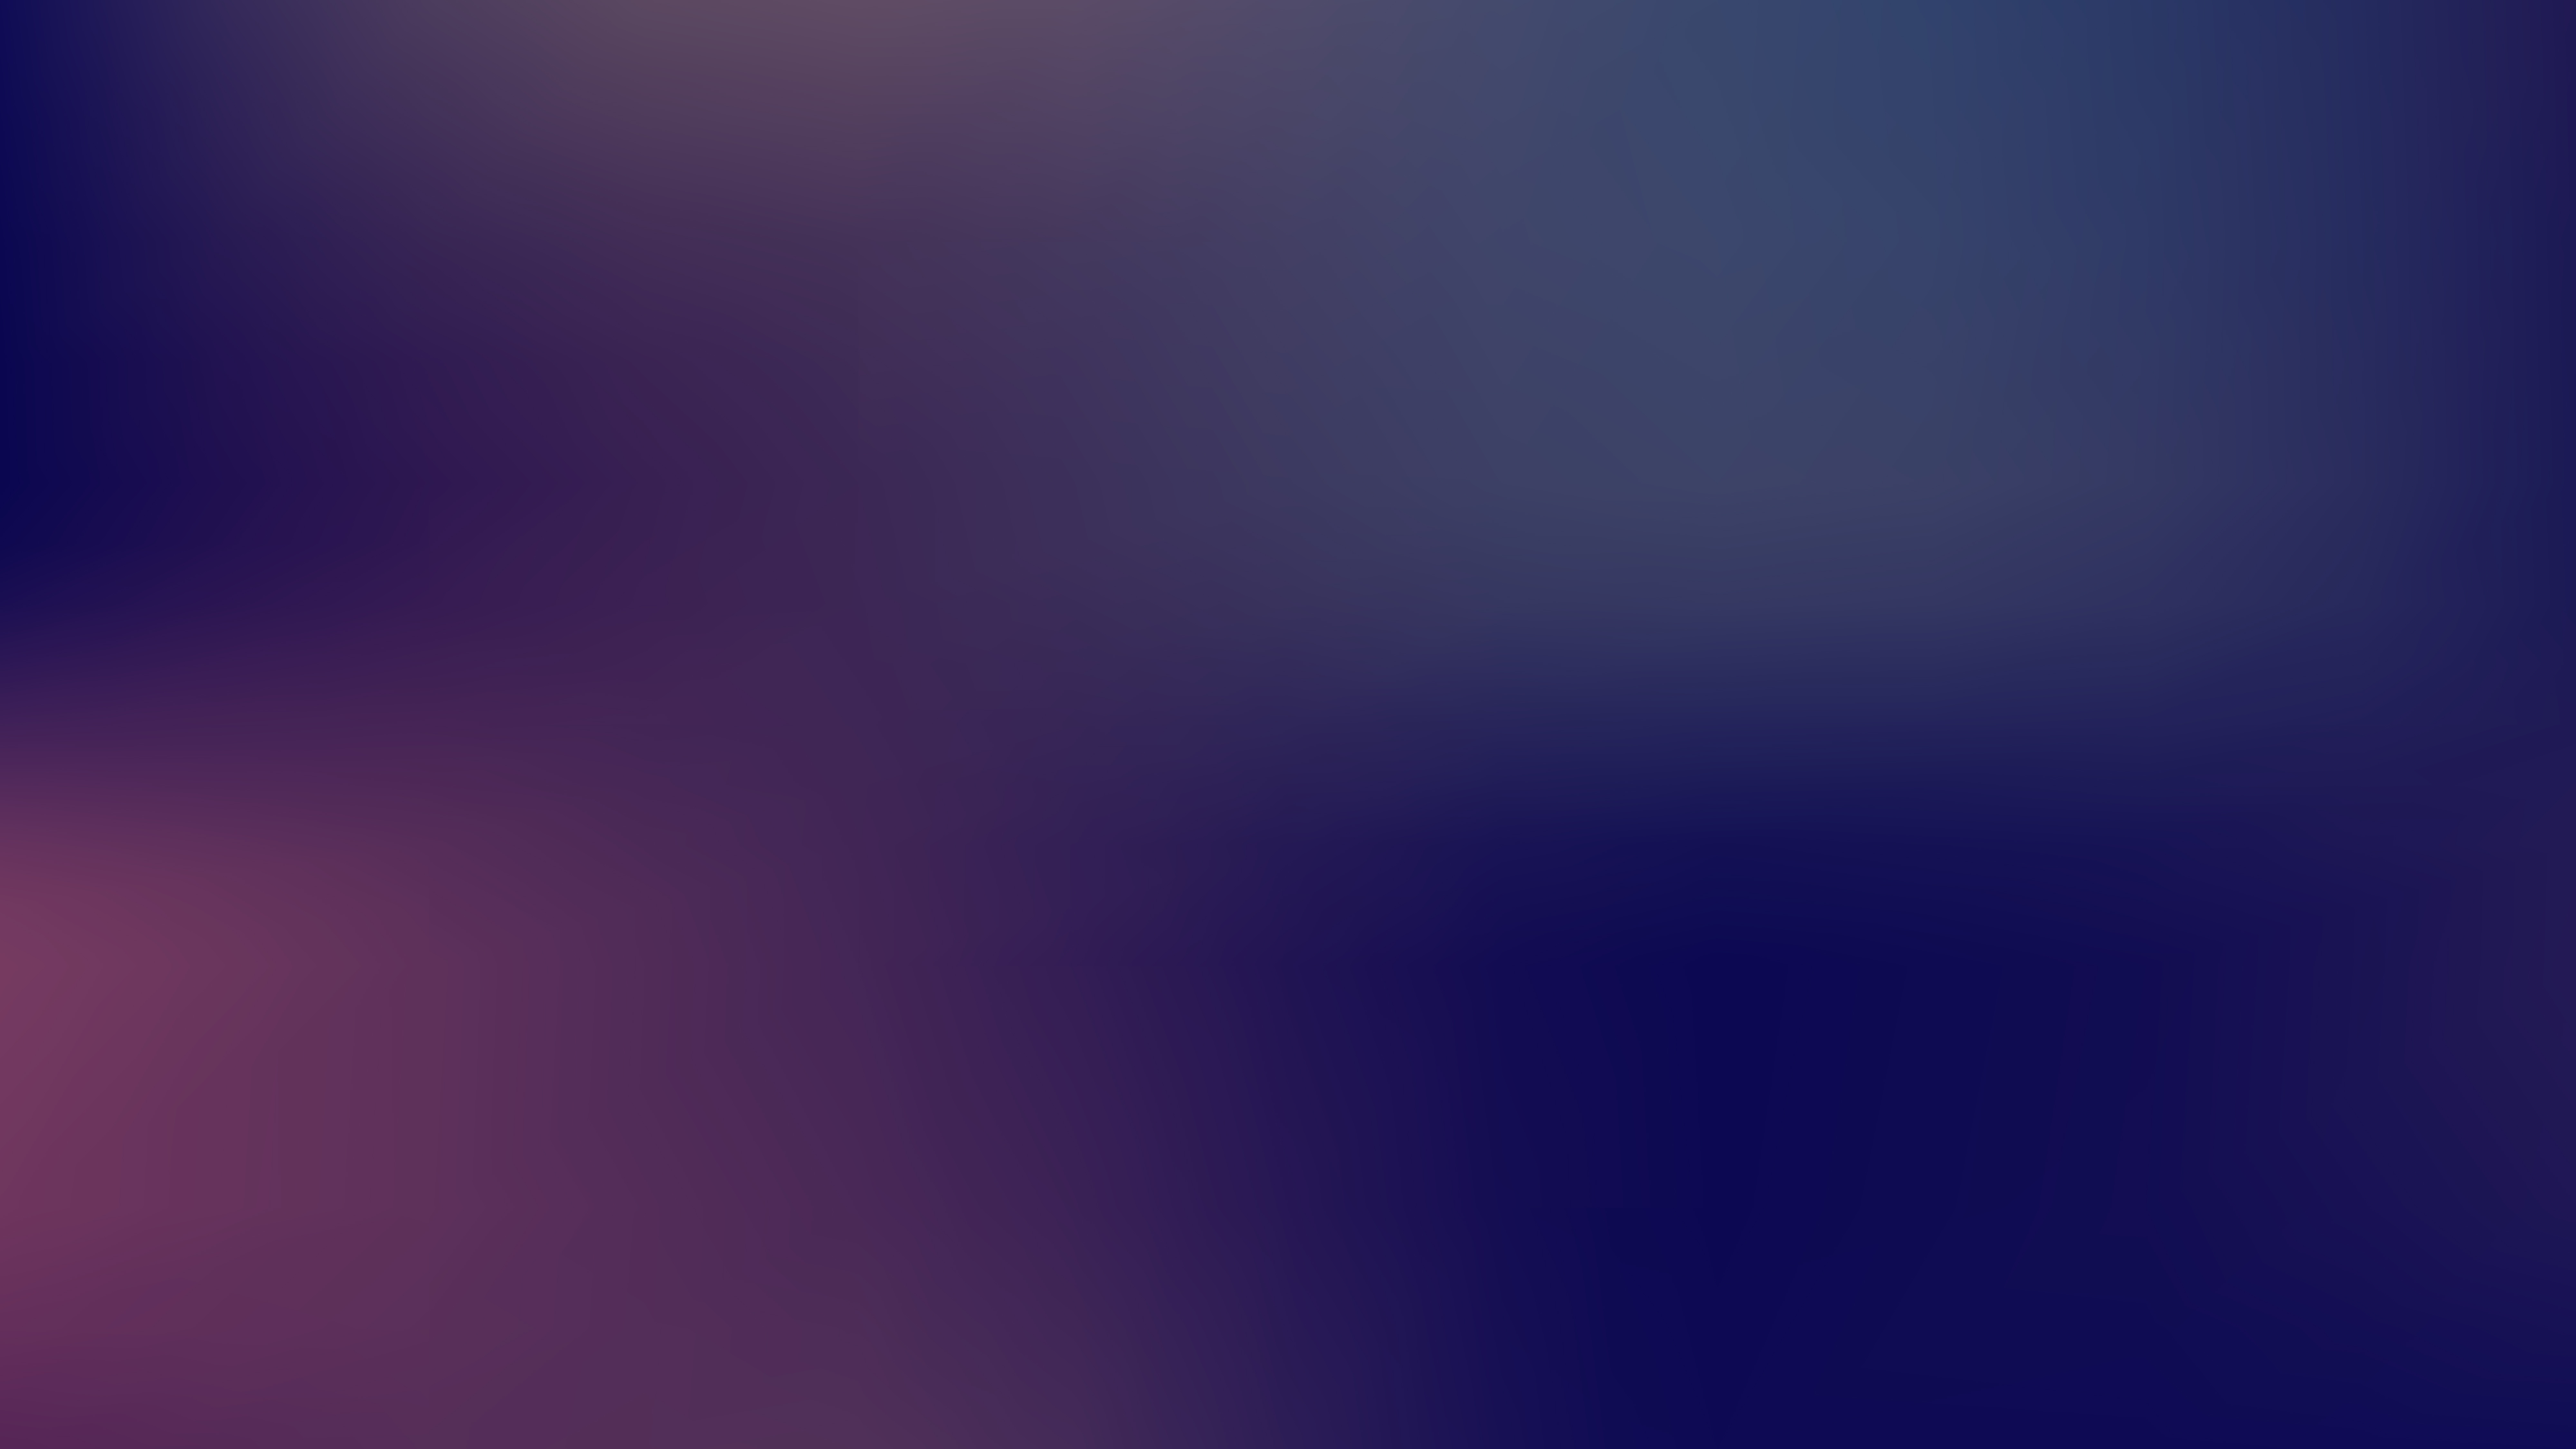 Dark Color Presentation Background Graphic 8000x4500